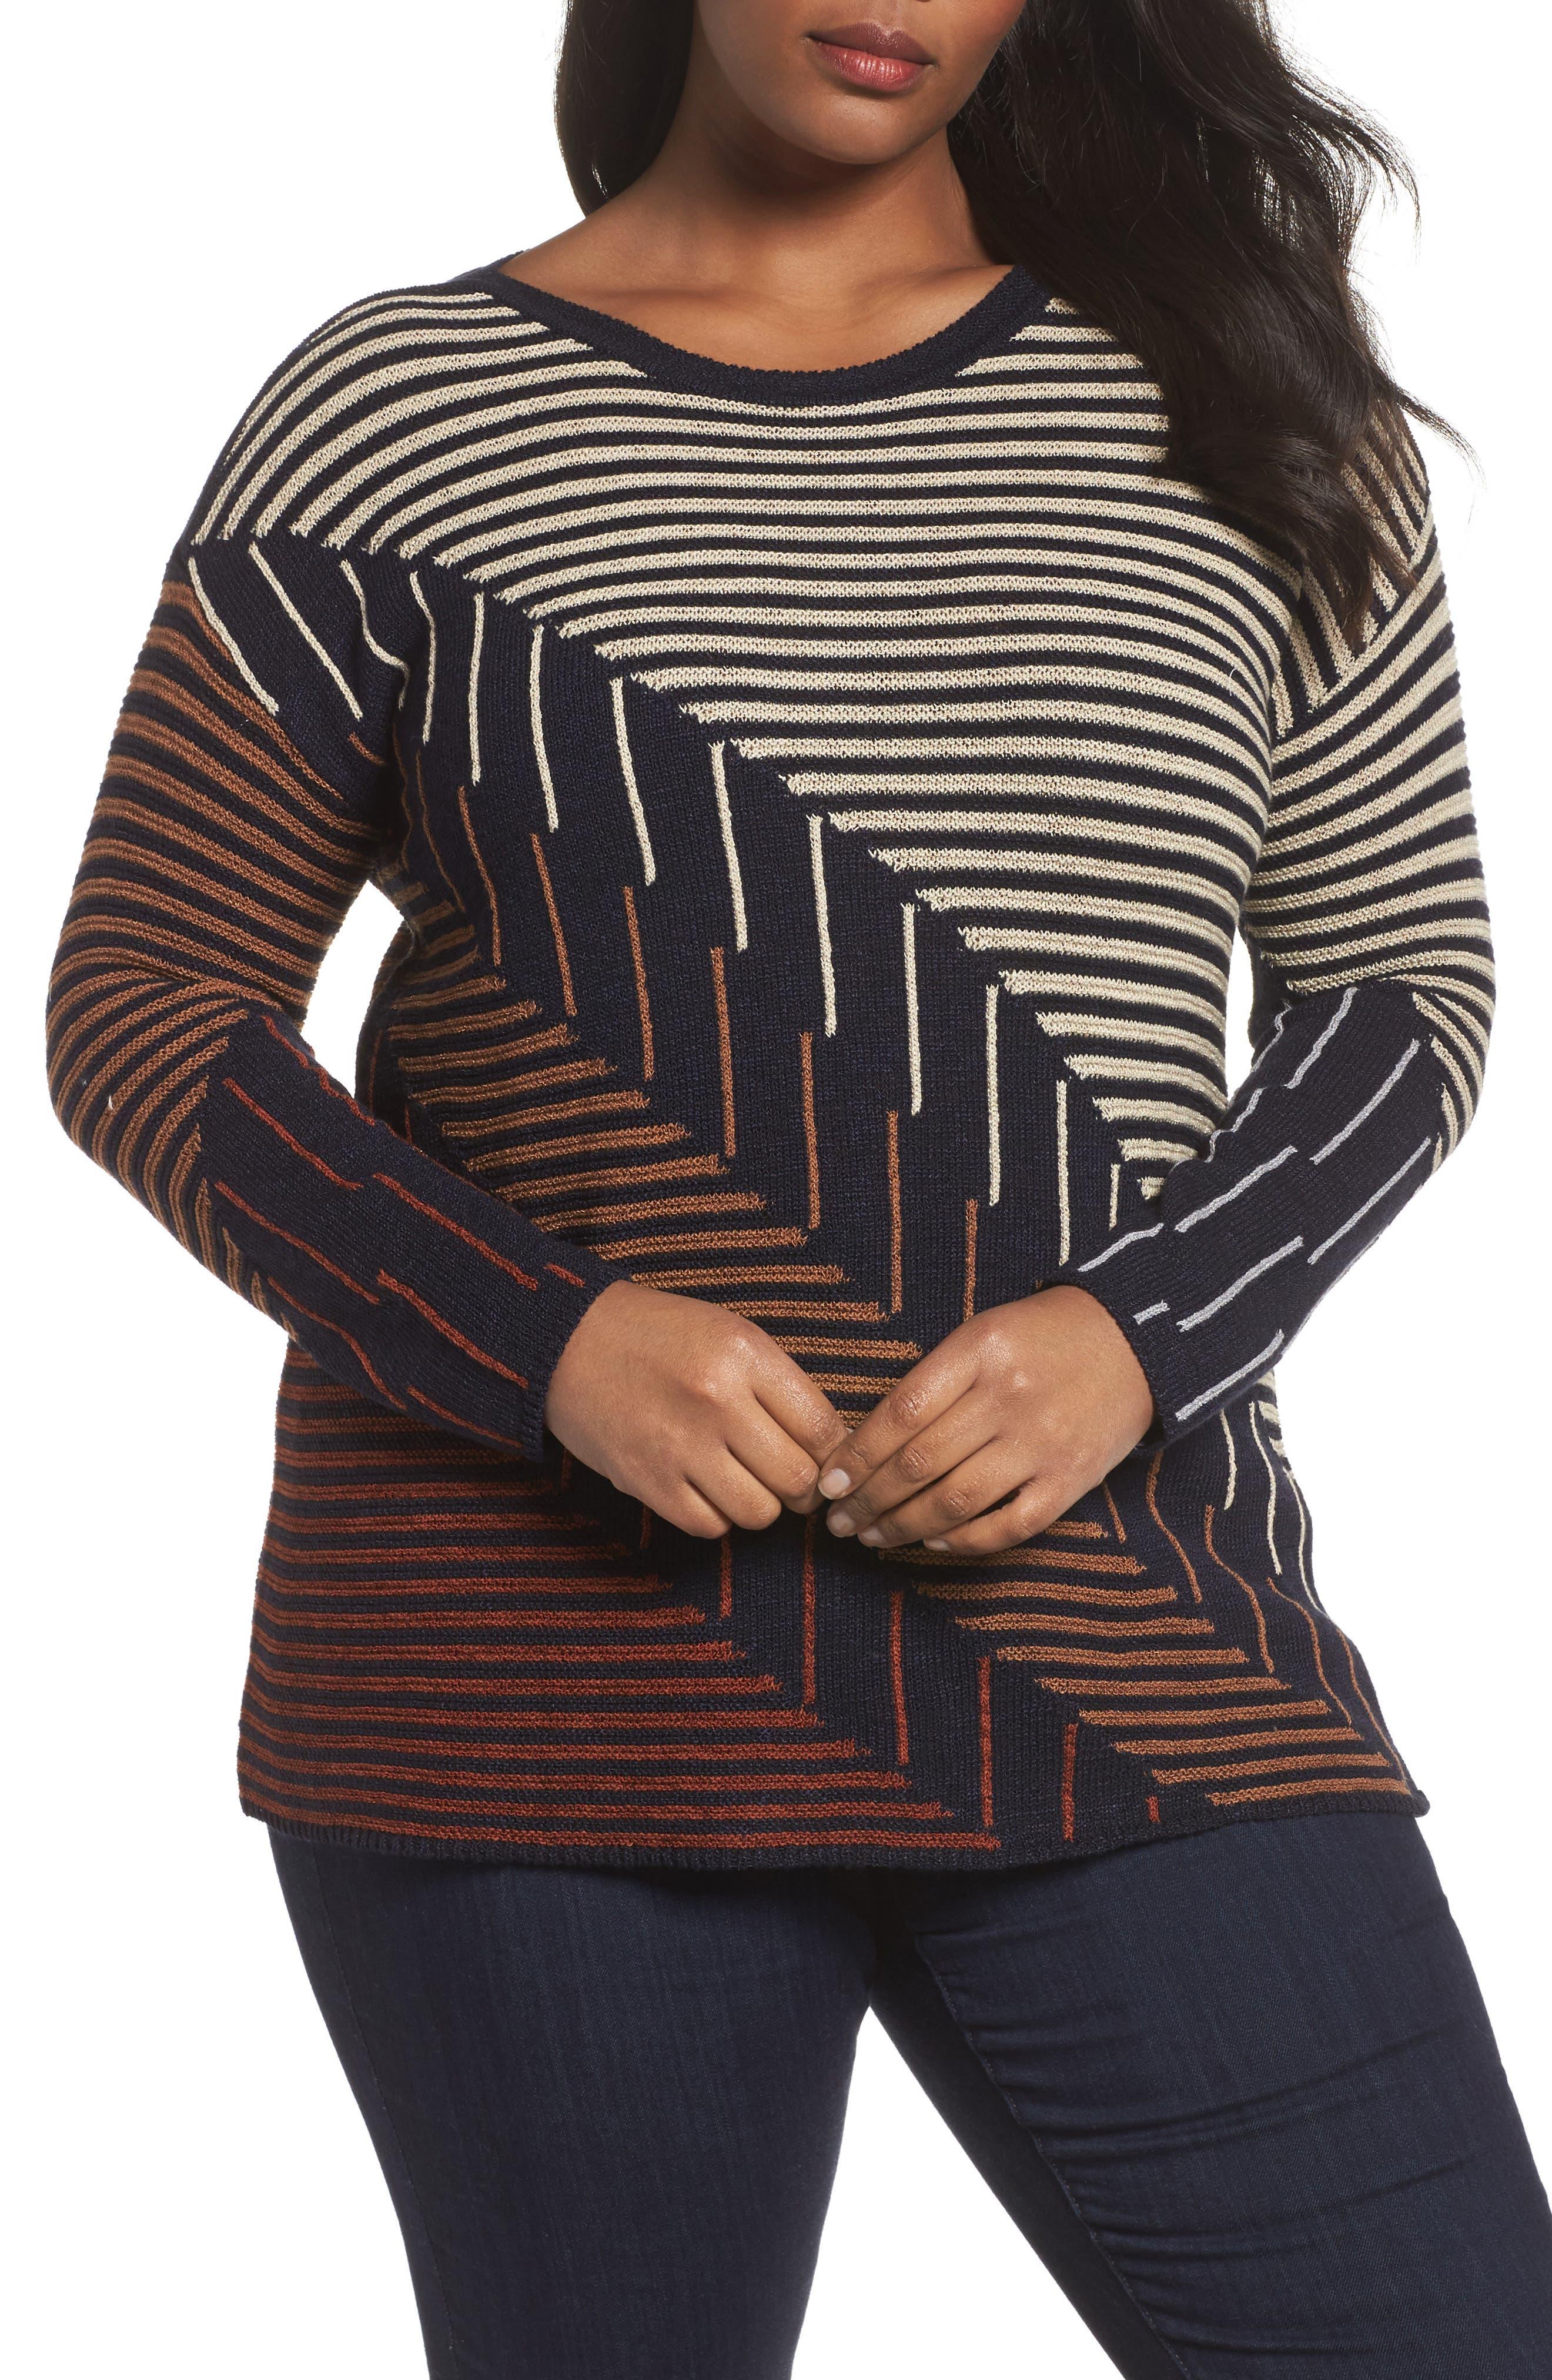 Alternate Image 1 Selected - NIC+ZOE Lagoon Sweater (Plus Size)